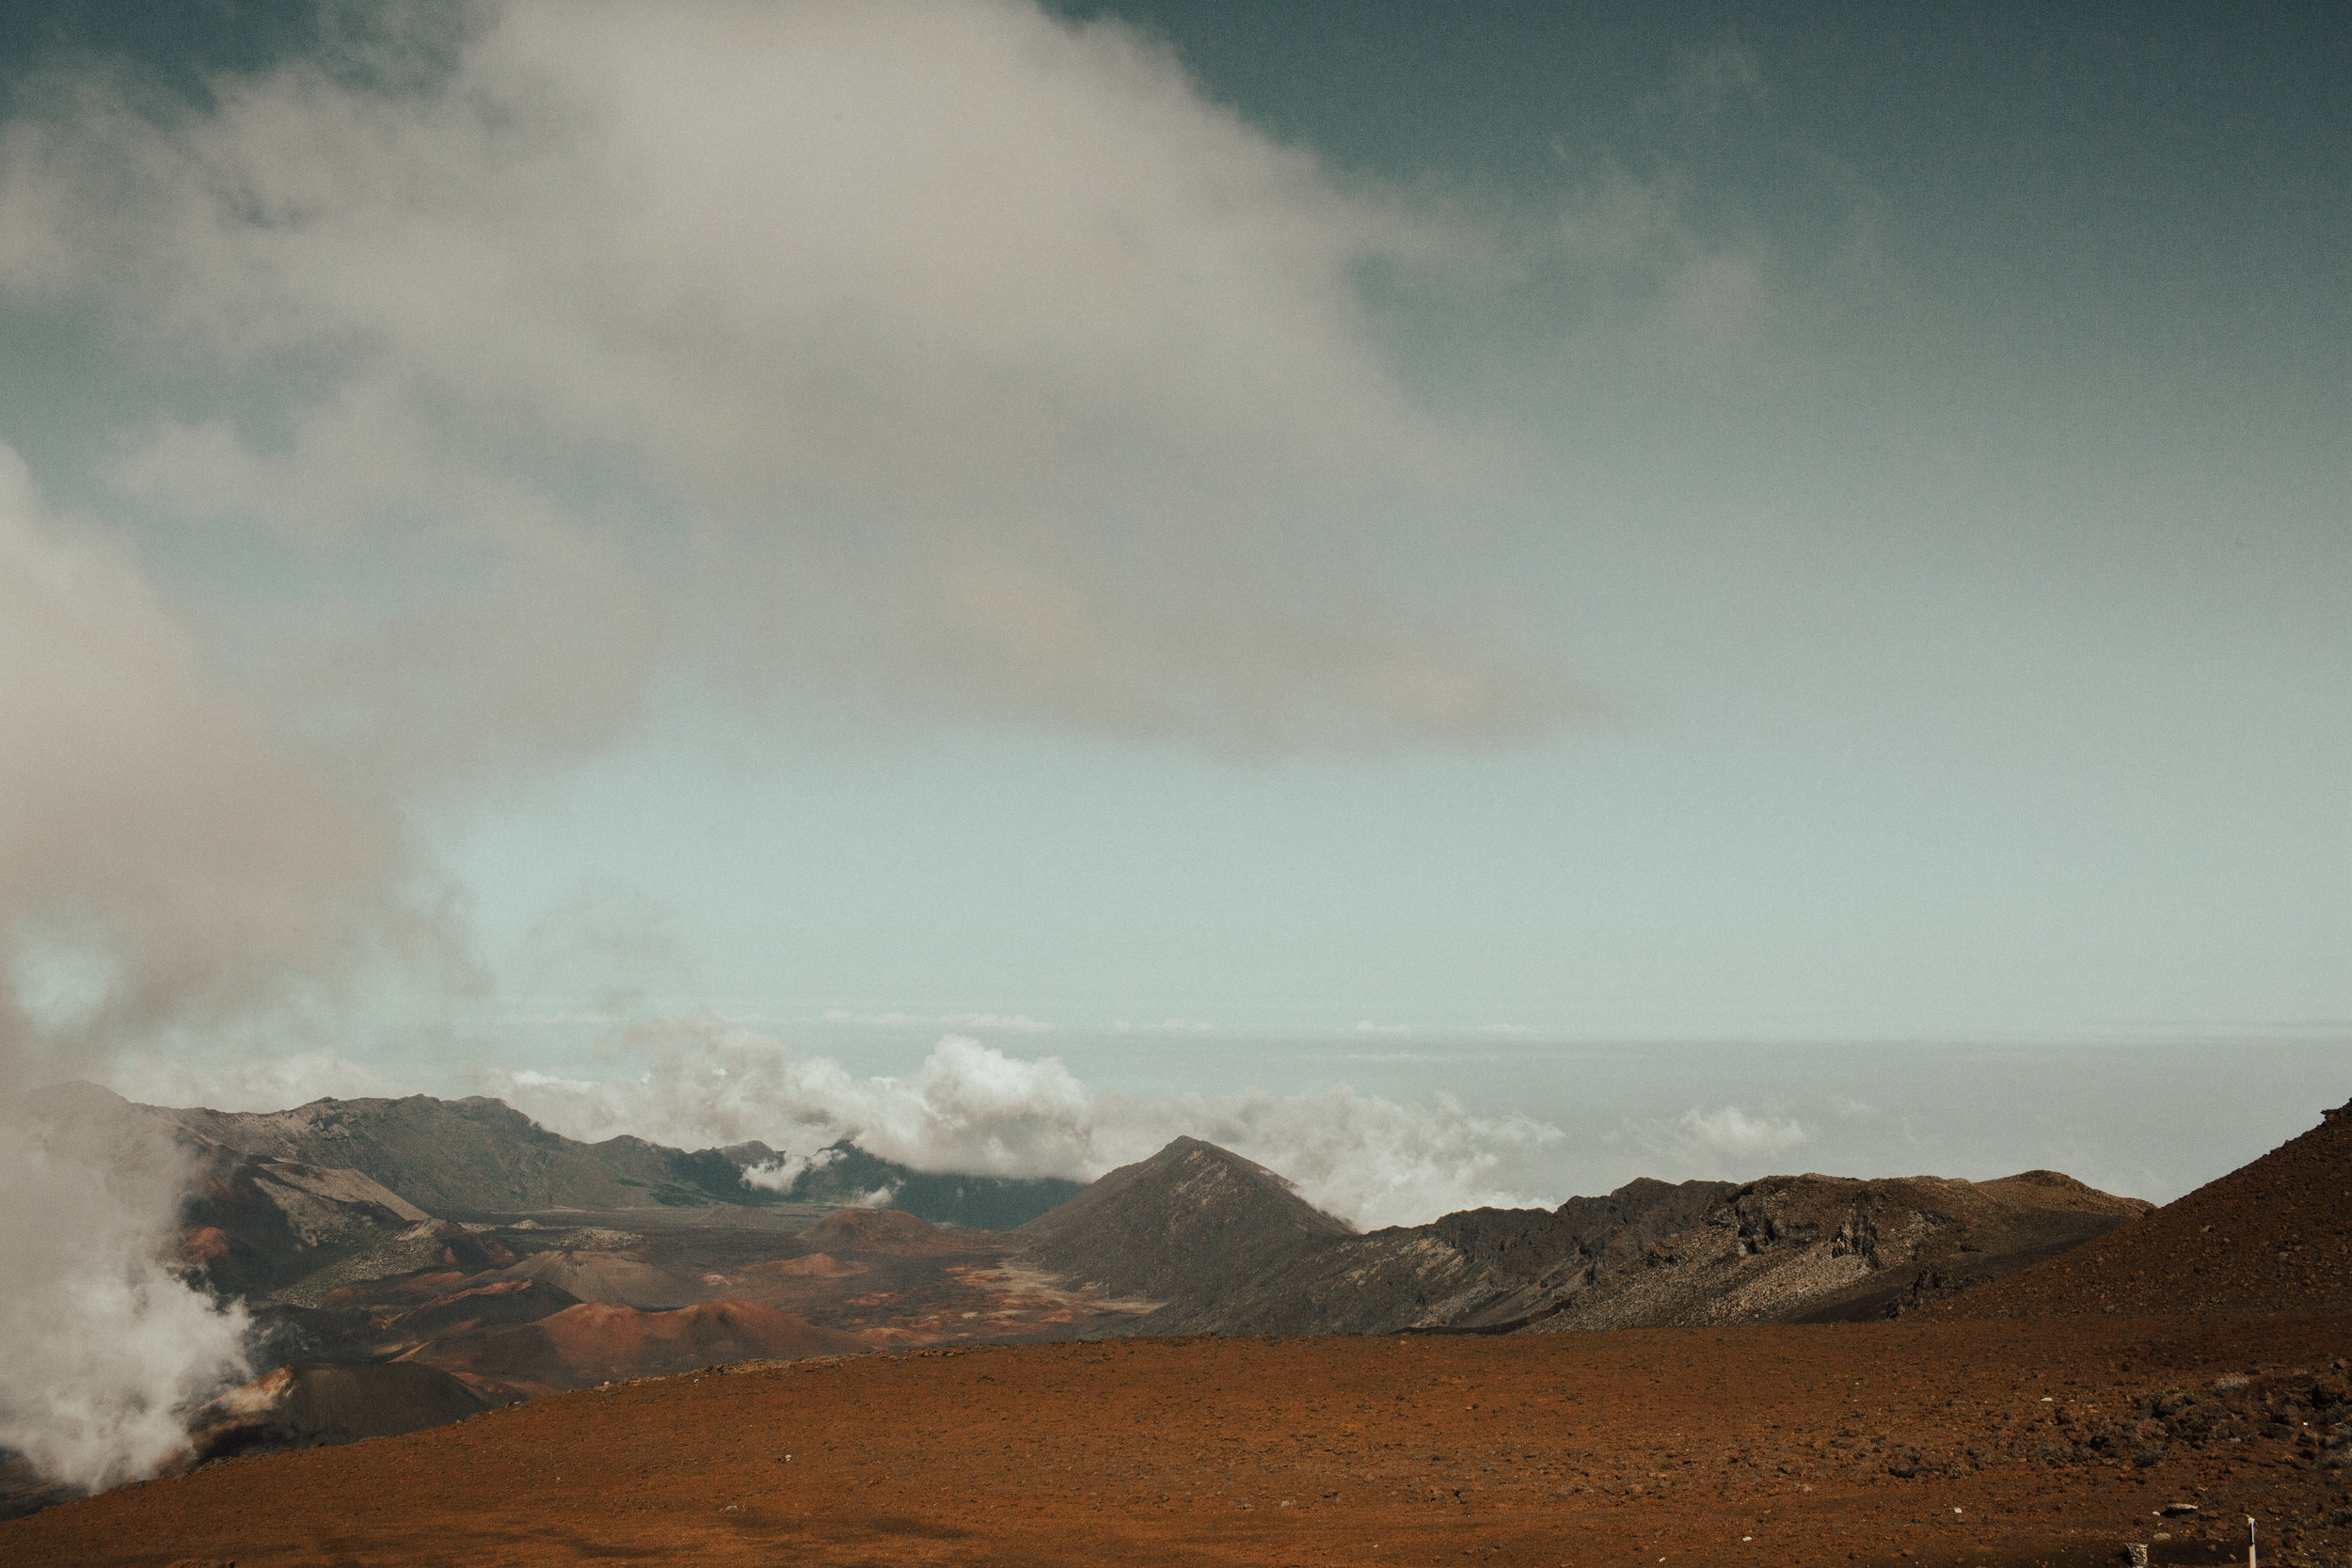 MAUI_HAWAII_JENNY CHOKBENGBOUN PHOTOS_haleakala national park